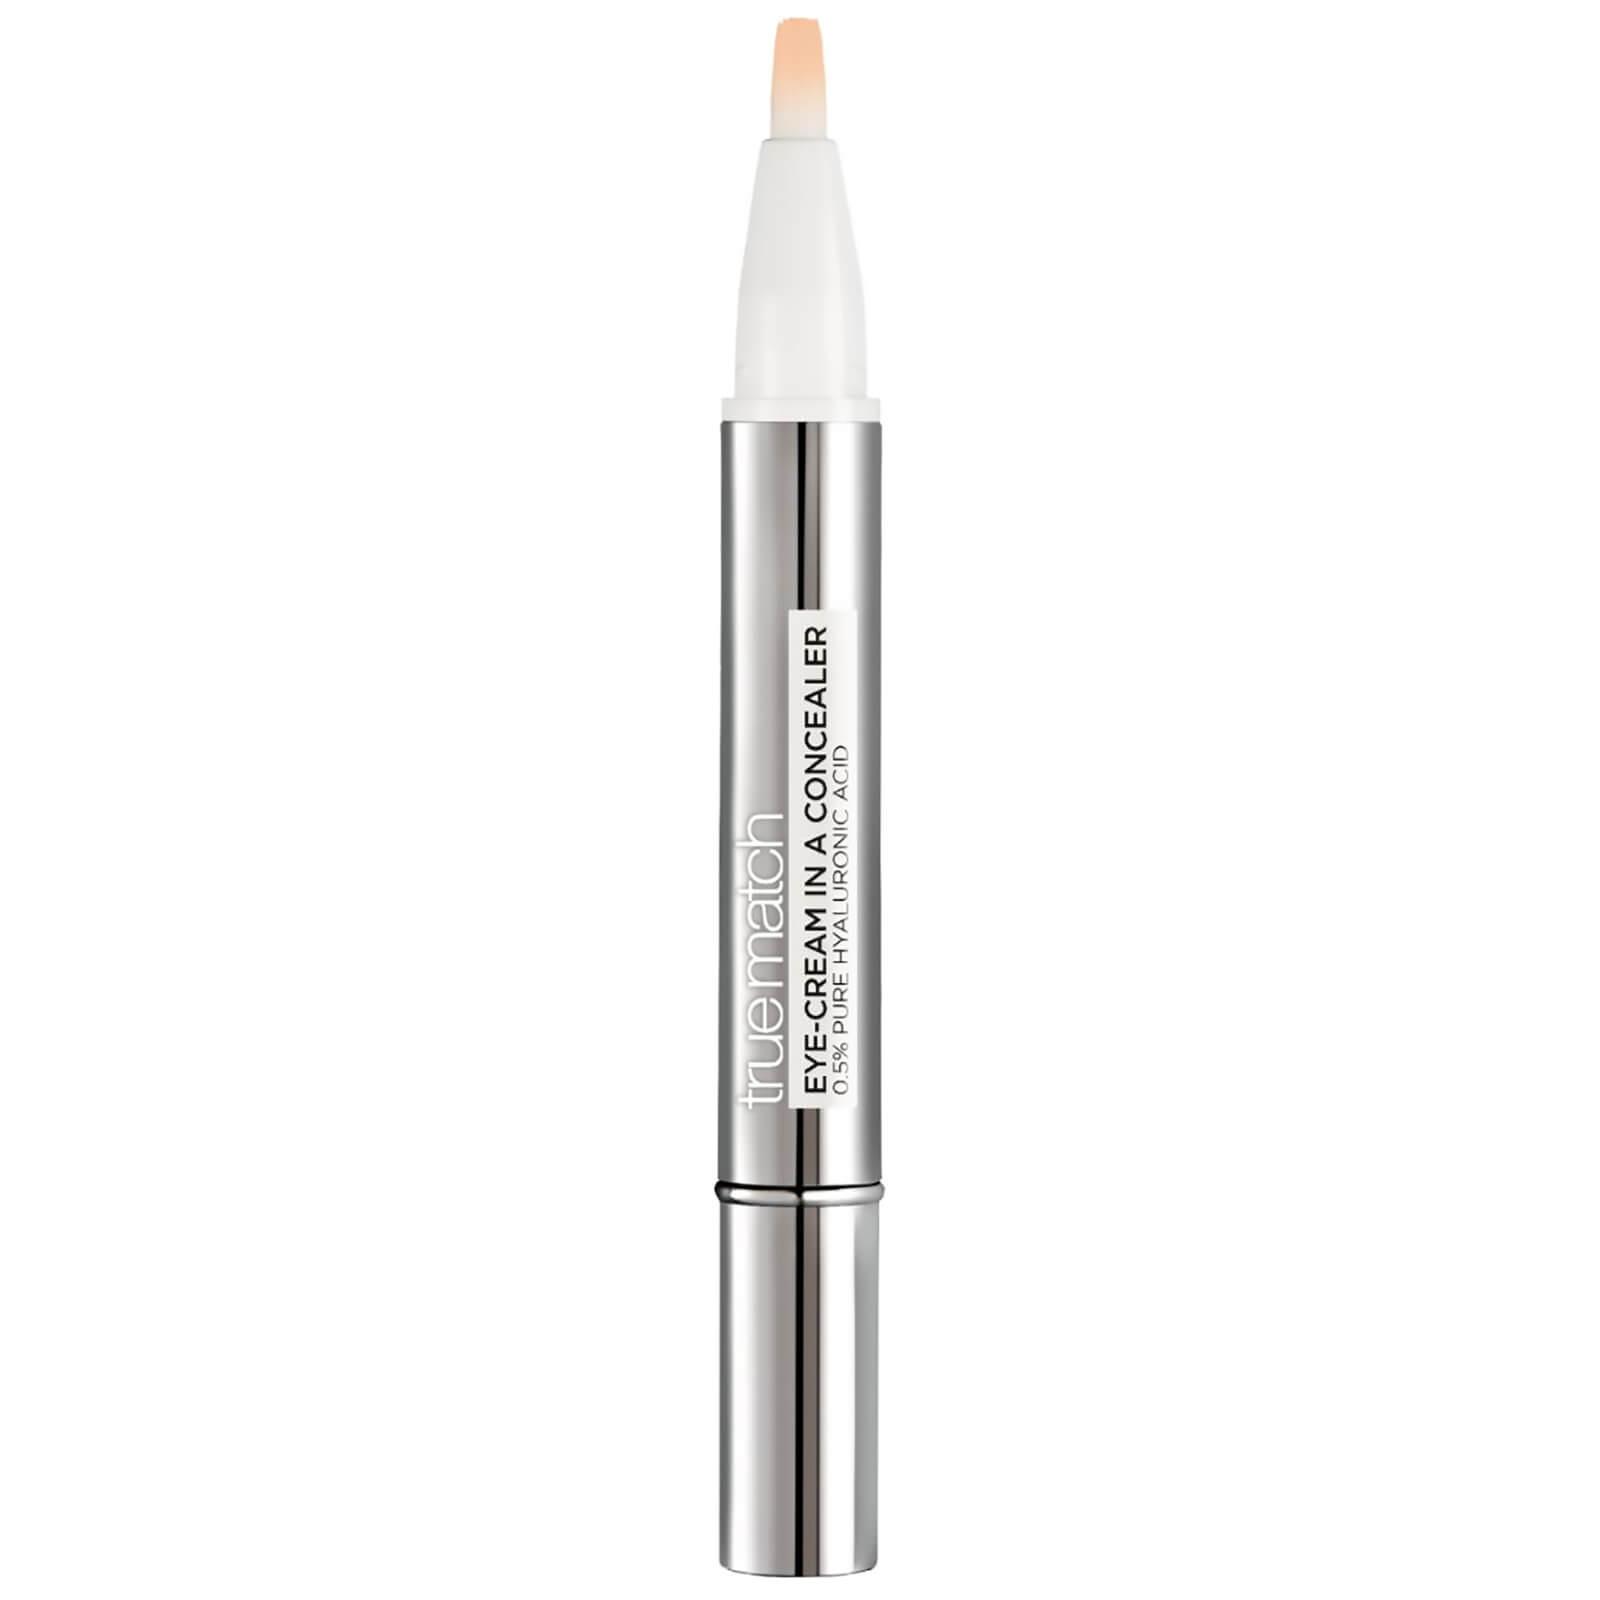 L'Oréal Paris True Match Eye Cream in a Concealer SPF20 (Various Shades) - 1-2D Ivory Beige